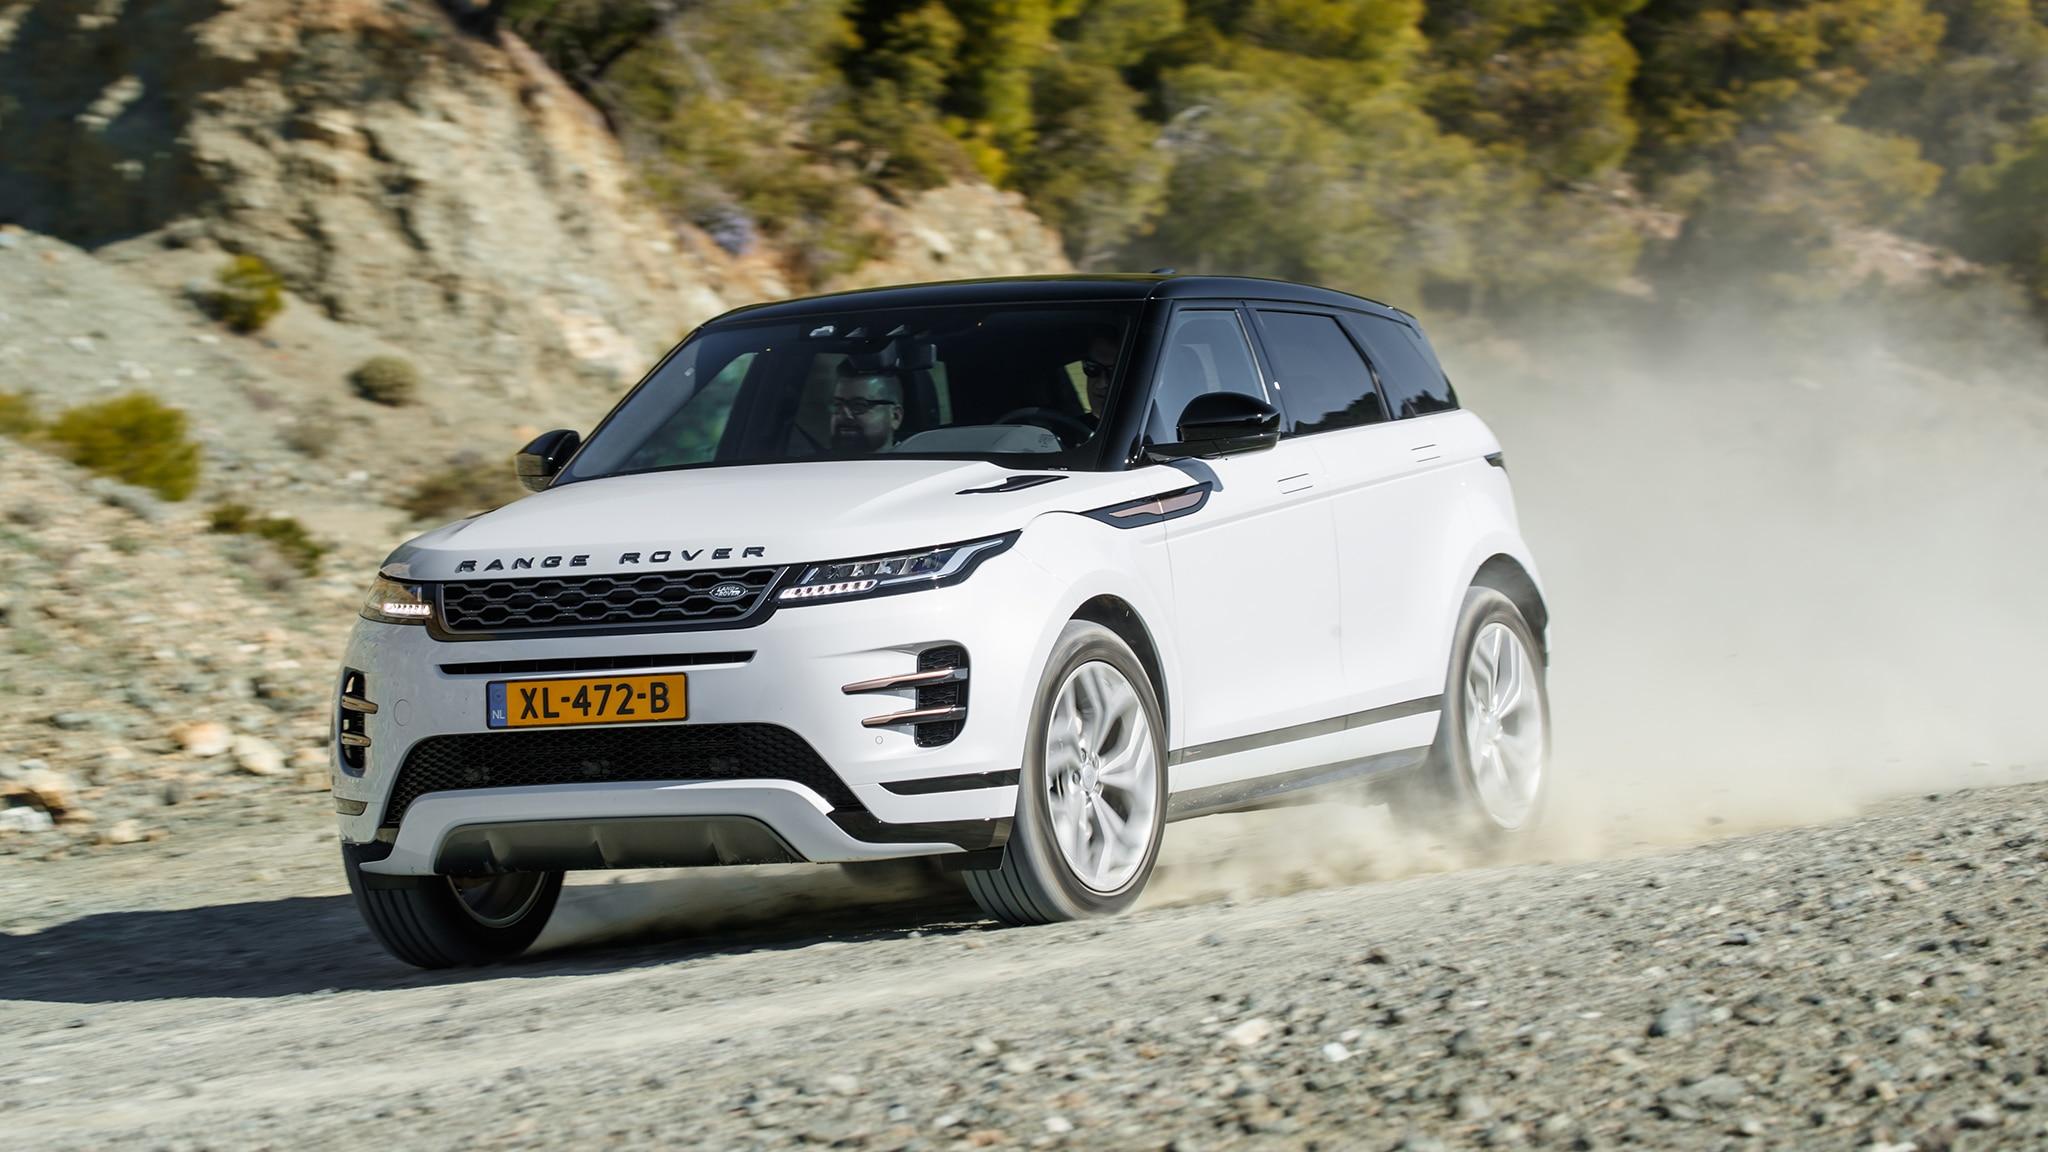 2020 Range Rover Evoque Xl Price, Design and Review